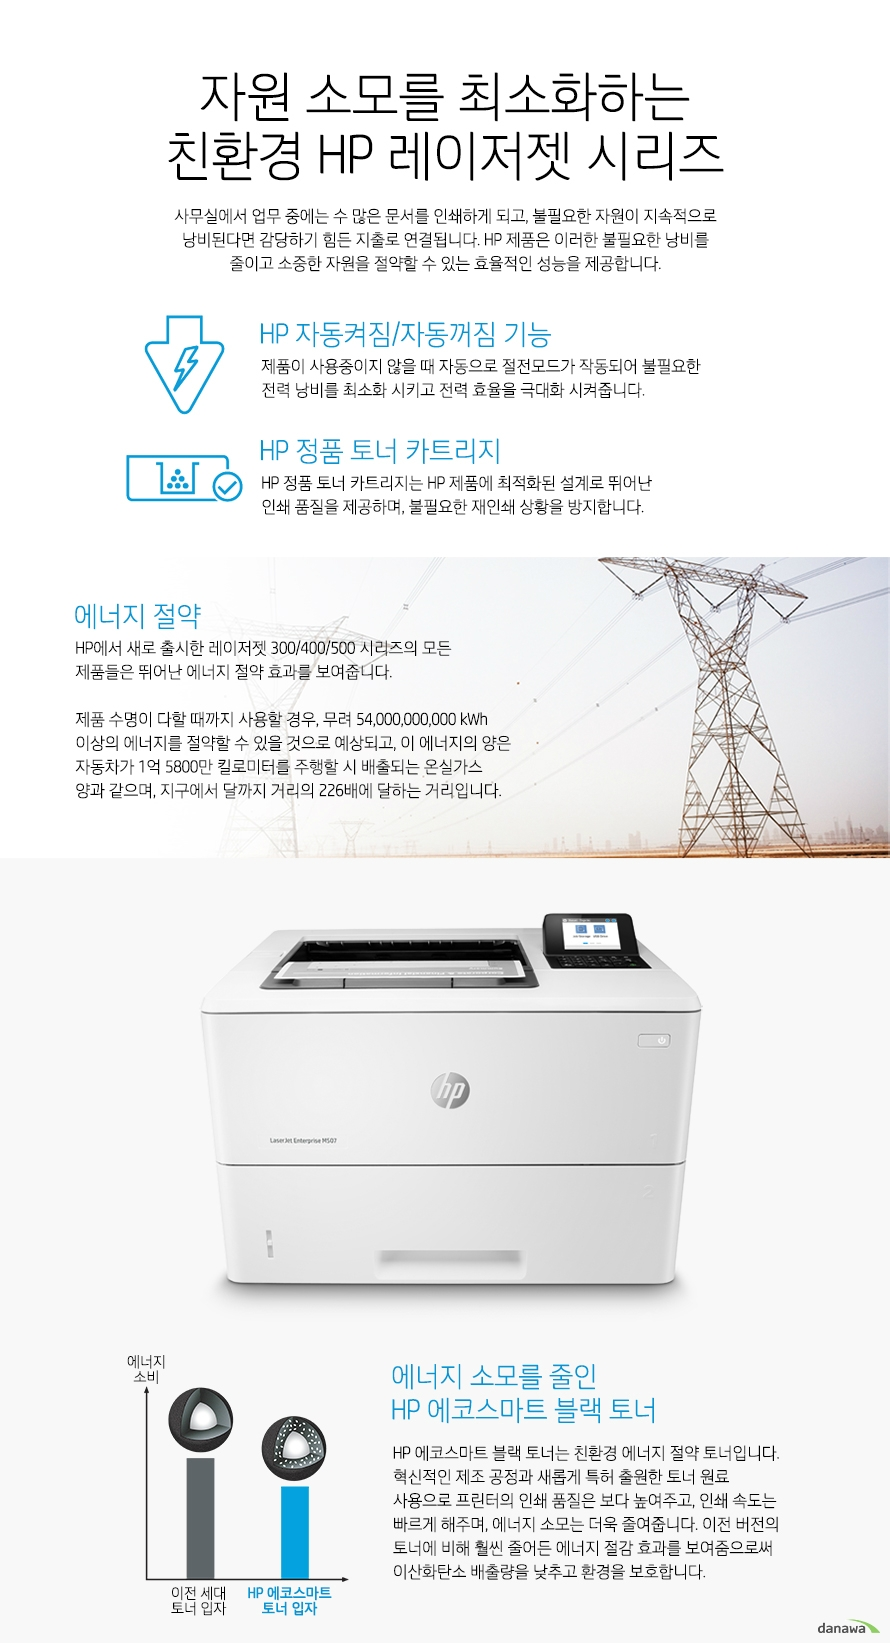 HP 레이저젯 엔터프라이즈 M507n (기본토너)